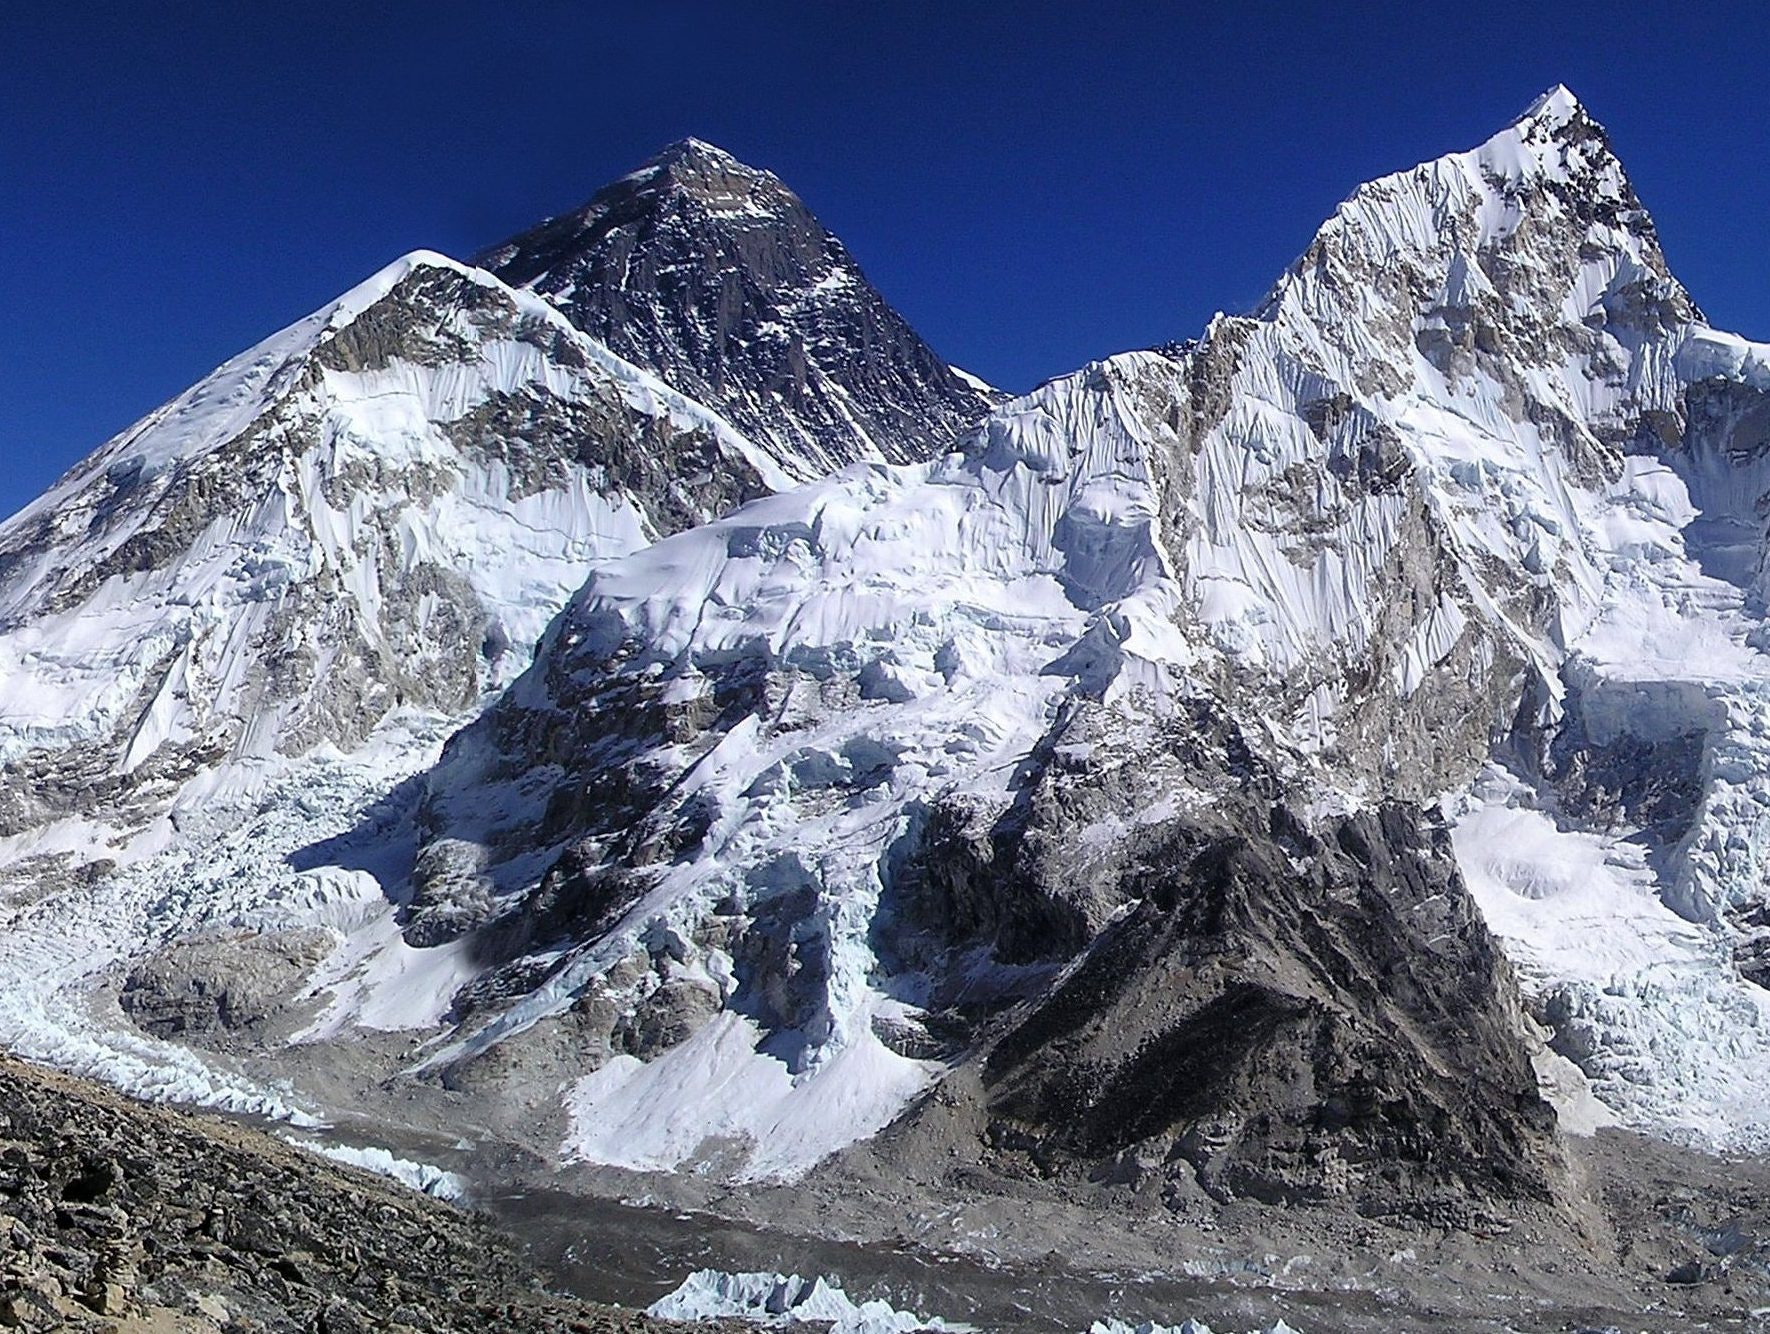 landscape-mountain-peak-mountains-51387